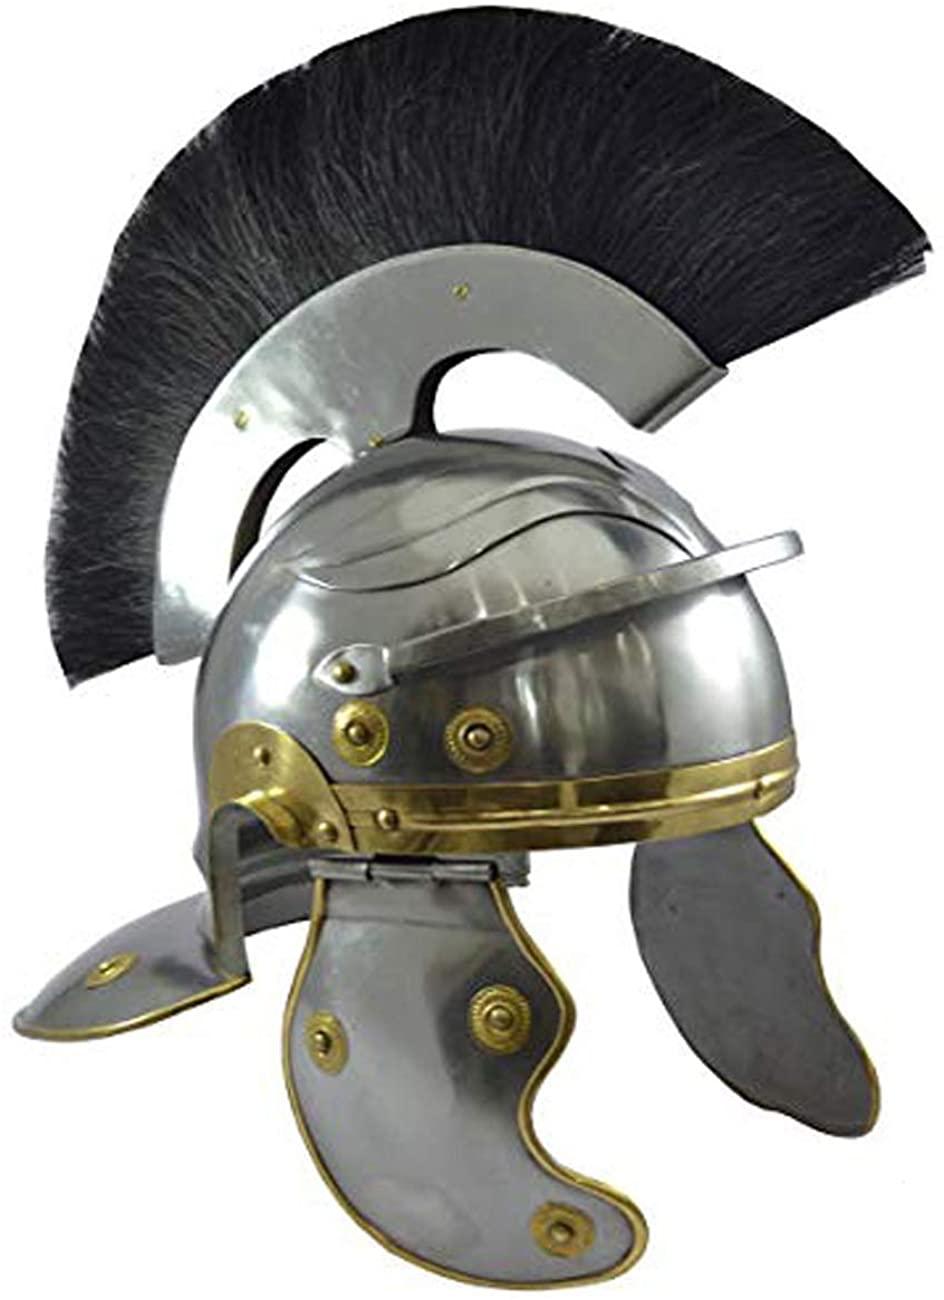 AnNafi Roman Centurion Helmet Armor w/Black Plume | Medieval Metal Replica Helm | Soldier Costume Gladiator